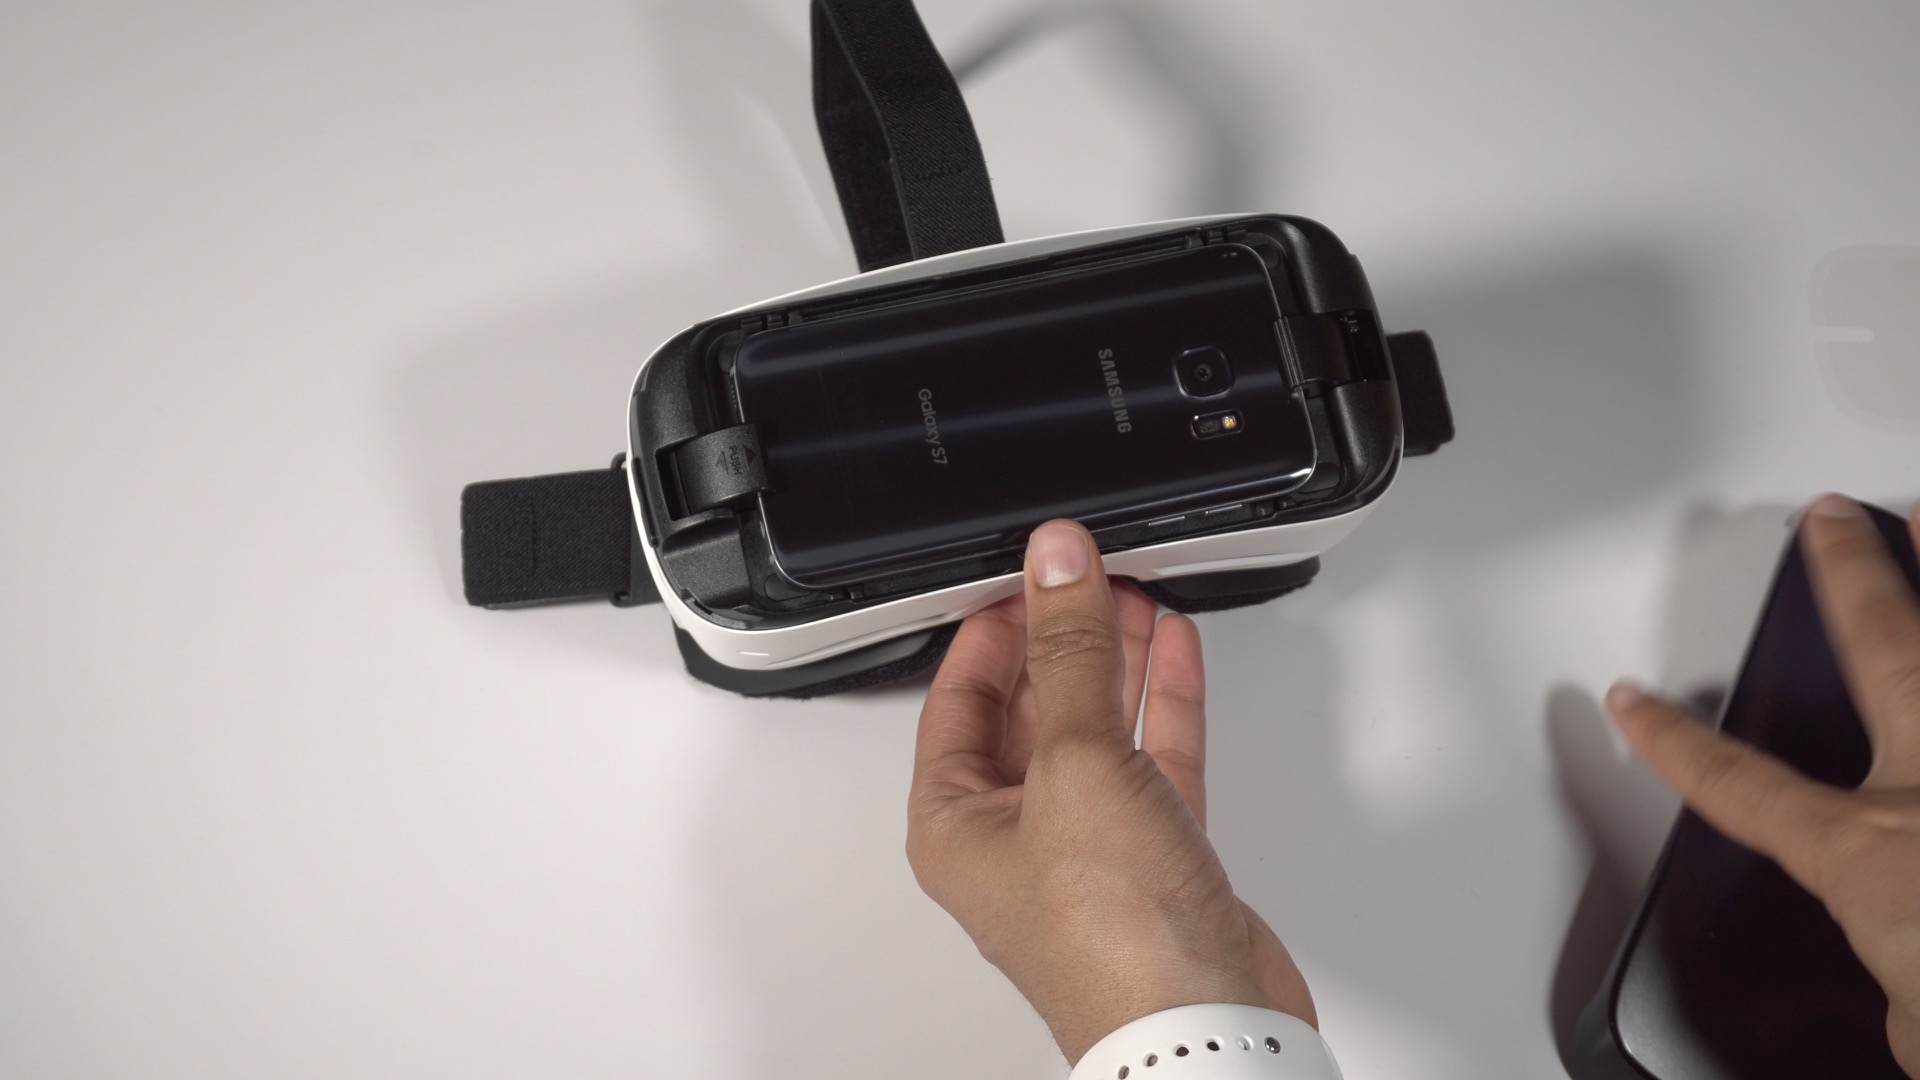 Gear VR Galaxy S7